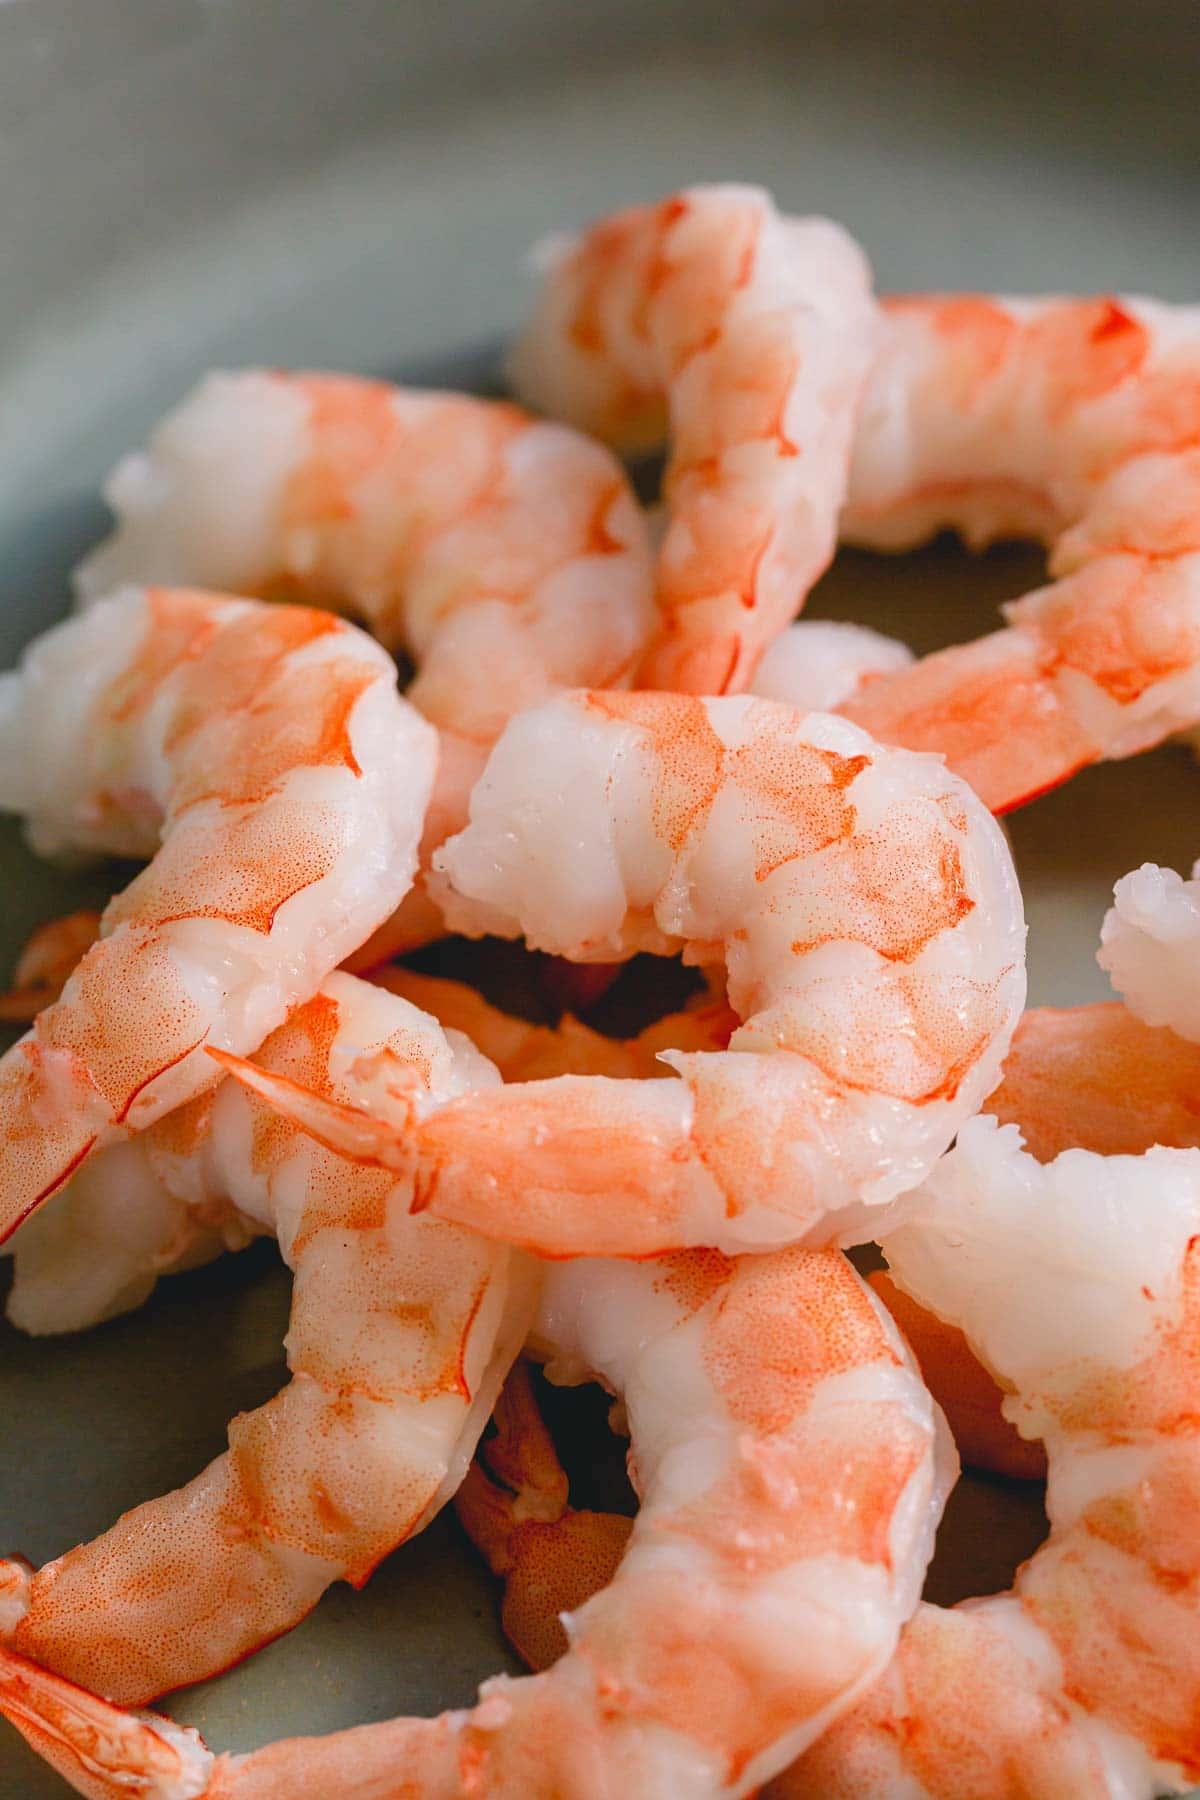 close up of boiled shrimp